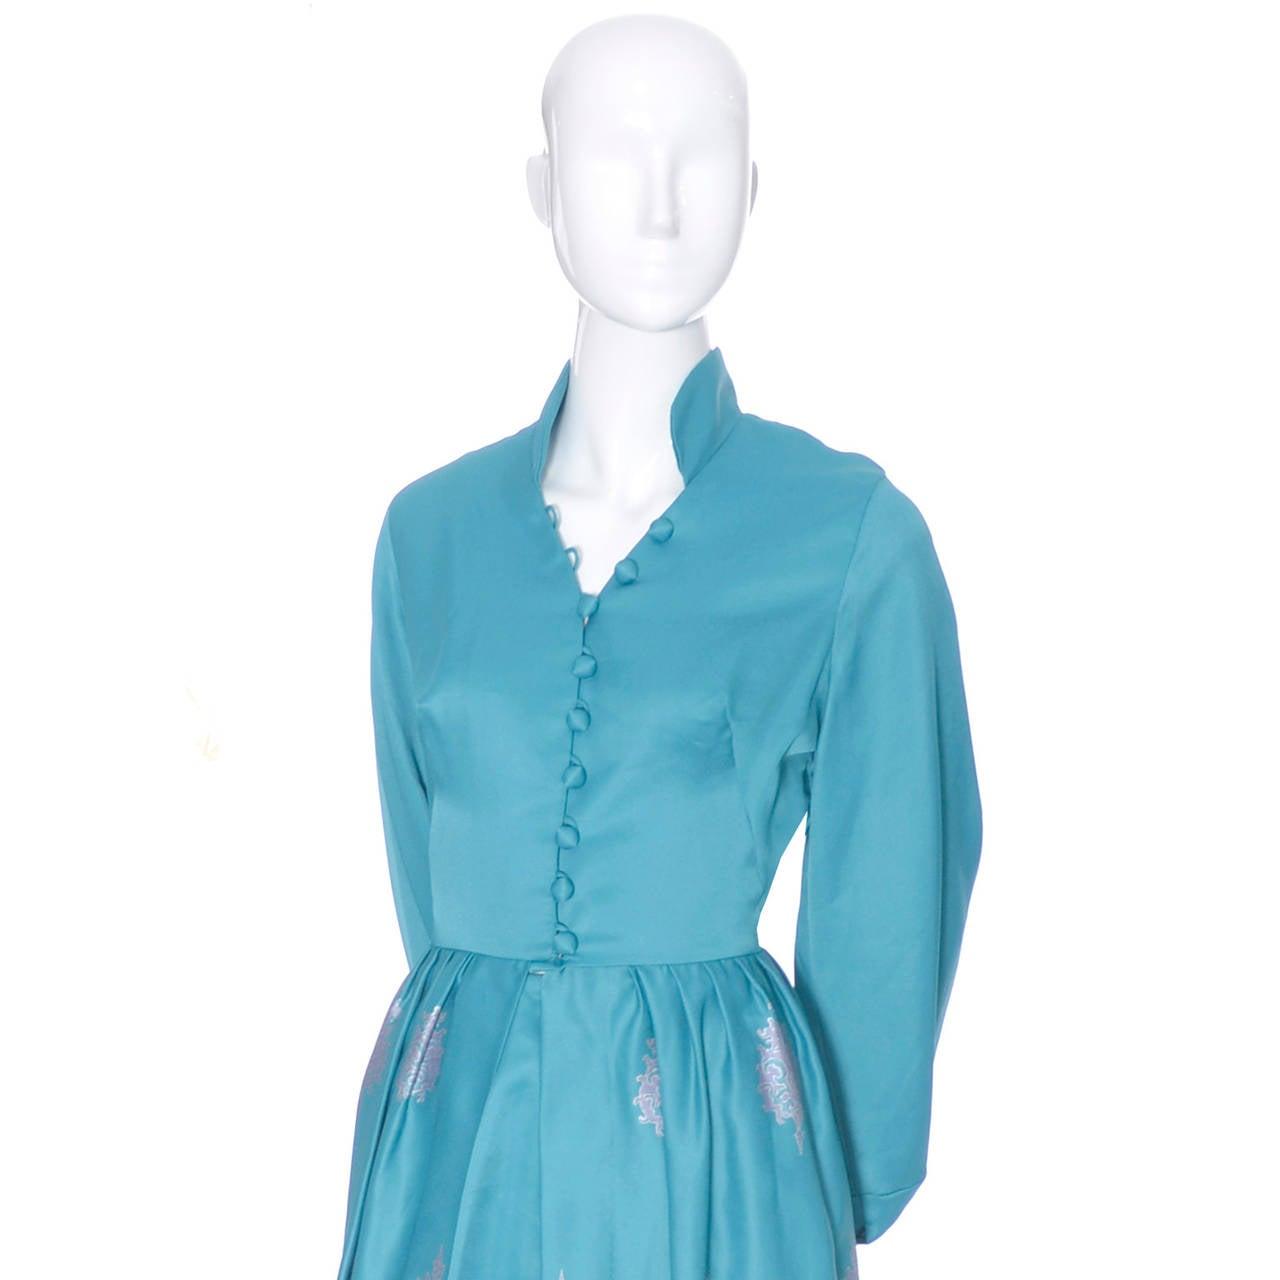 Blue Alfred Shaheen Master Printer Vintage 2 Pc Pants Evening Coat Ensemble For Sale